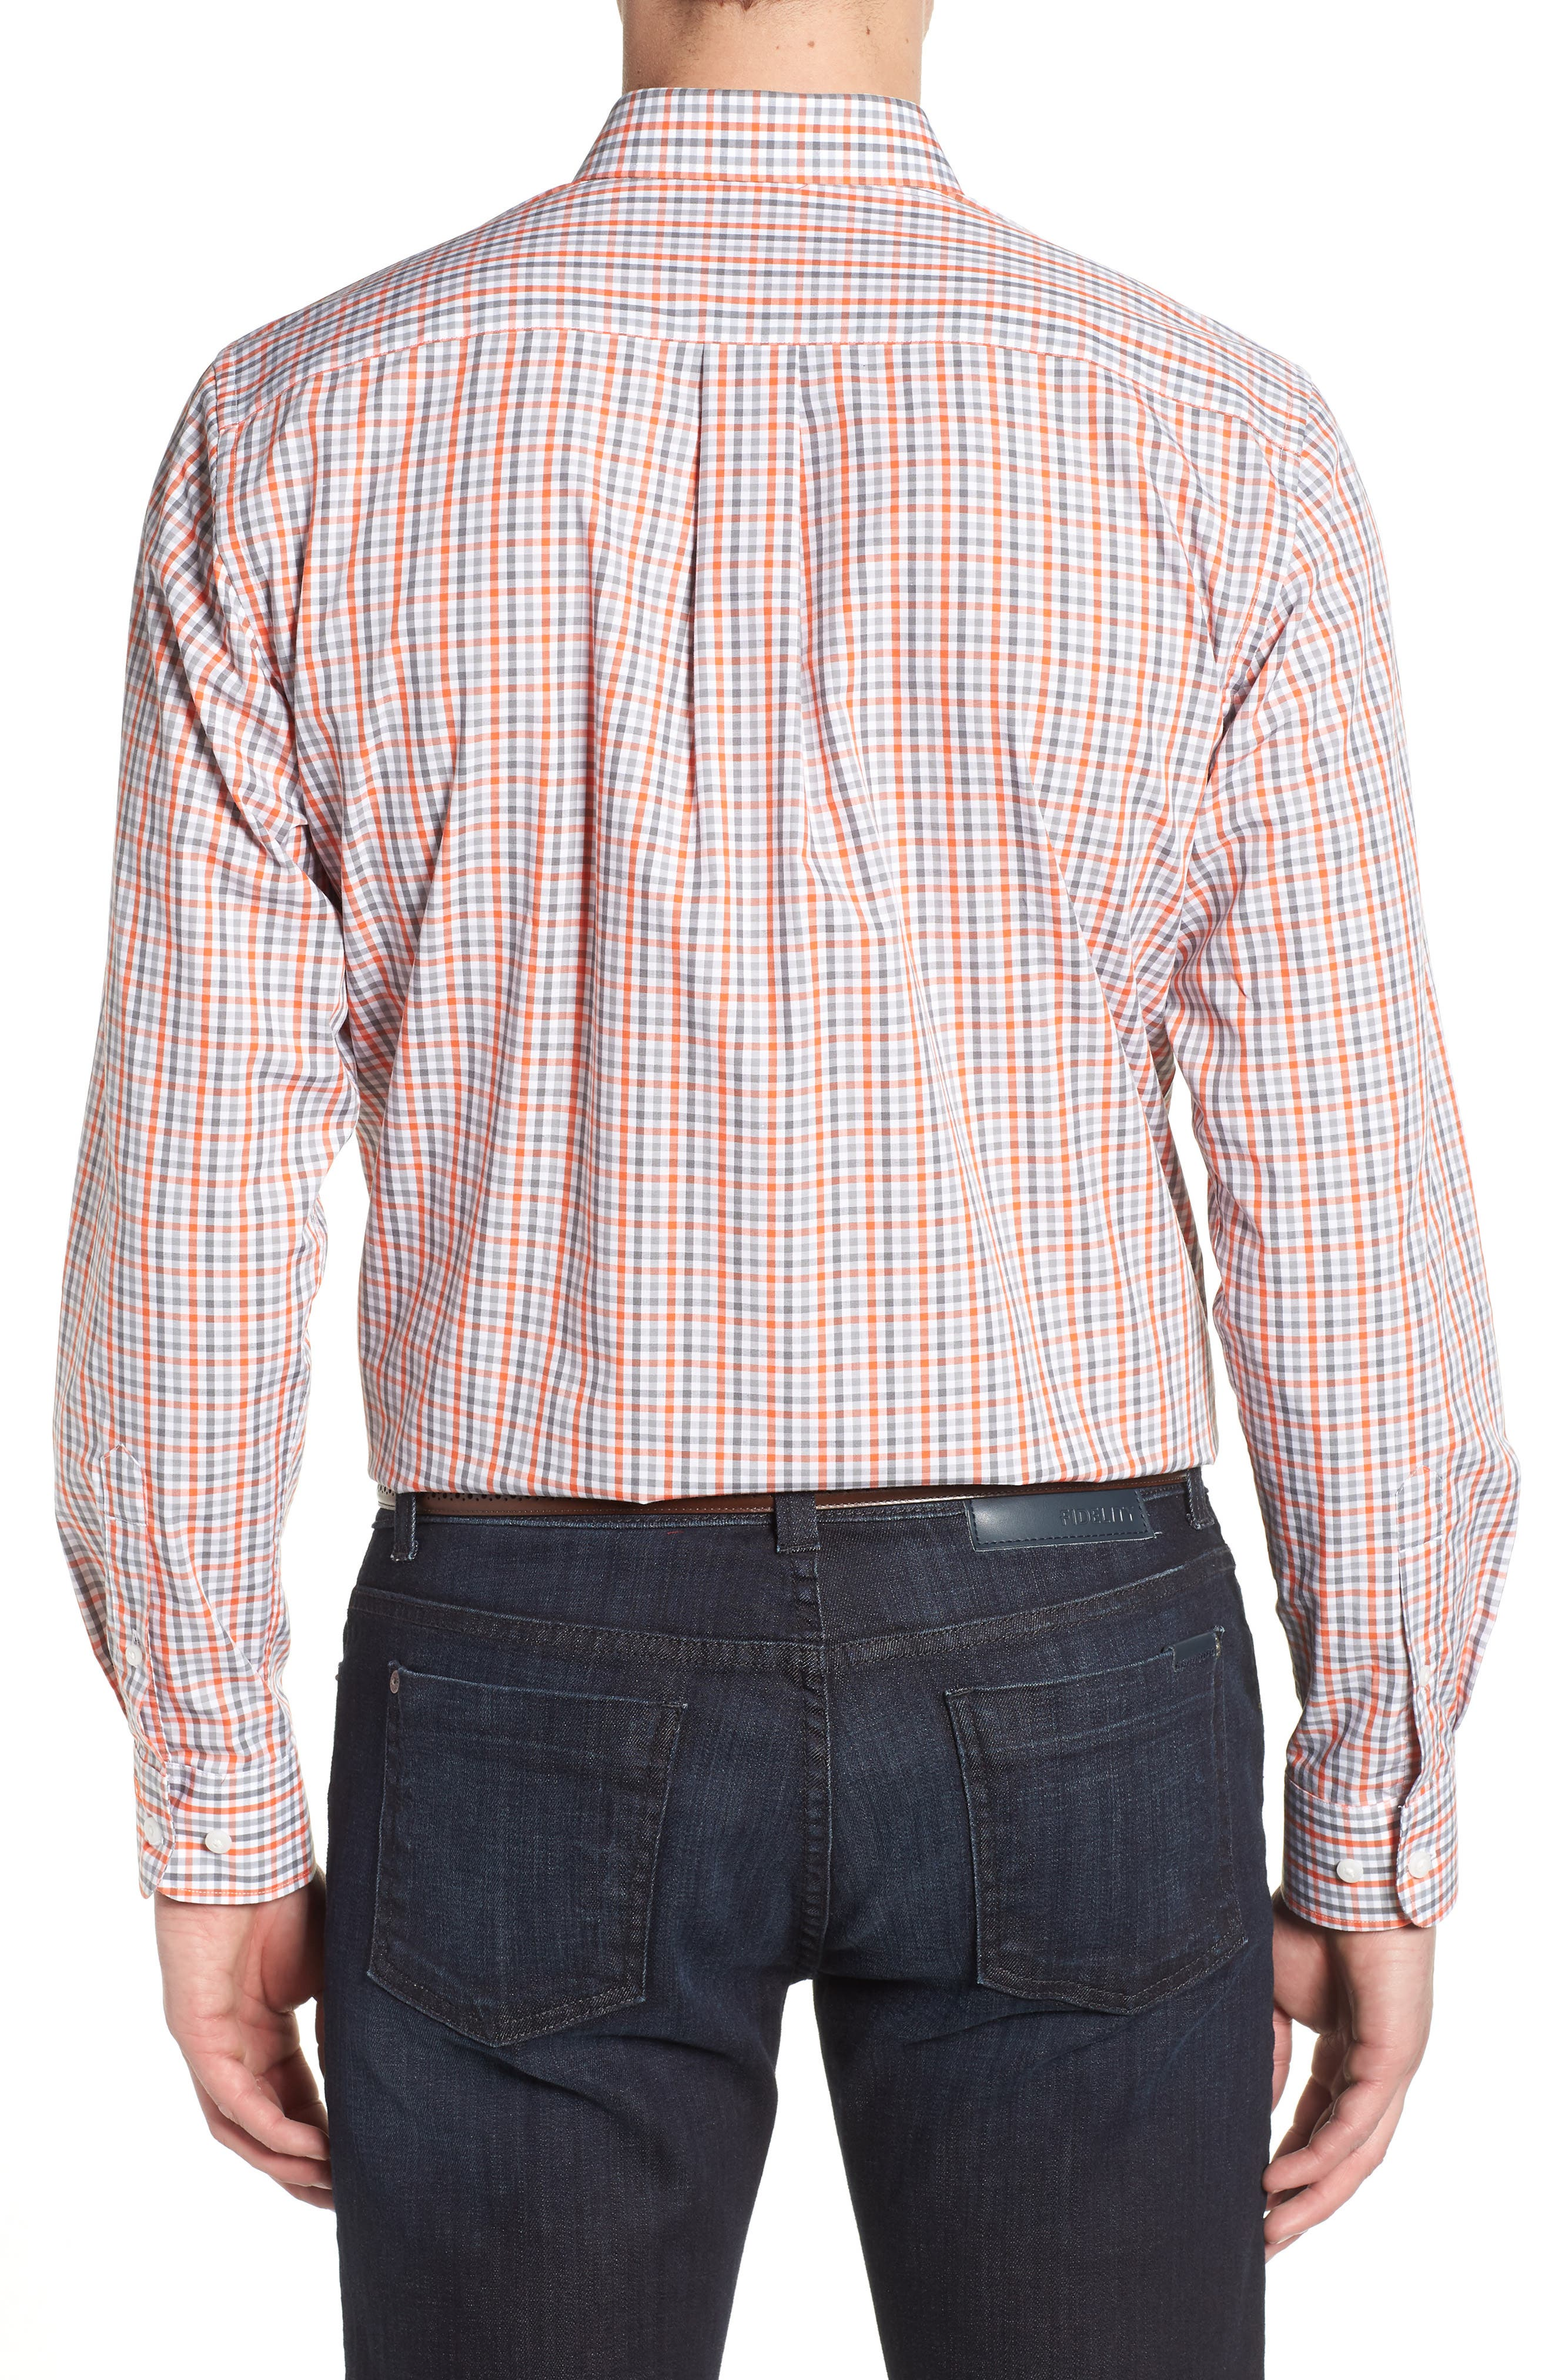 Cincinnati Bengals - Gilman Regular Fit Plaid Sport Shirt,                             Alternate thumbnail 2, color,                             COLLEGE ORANGE